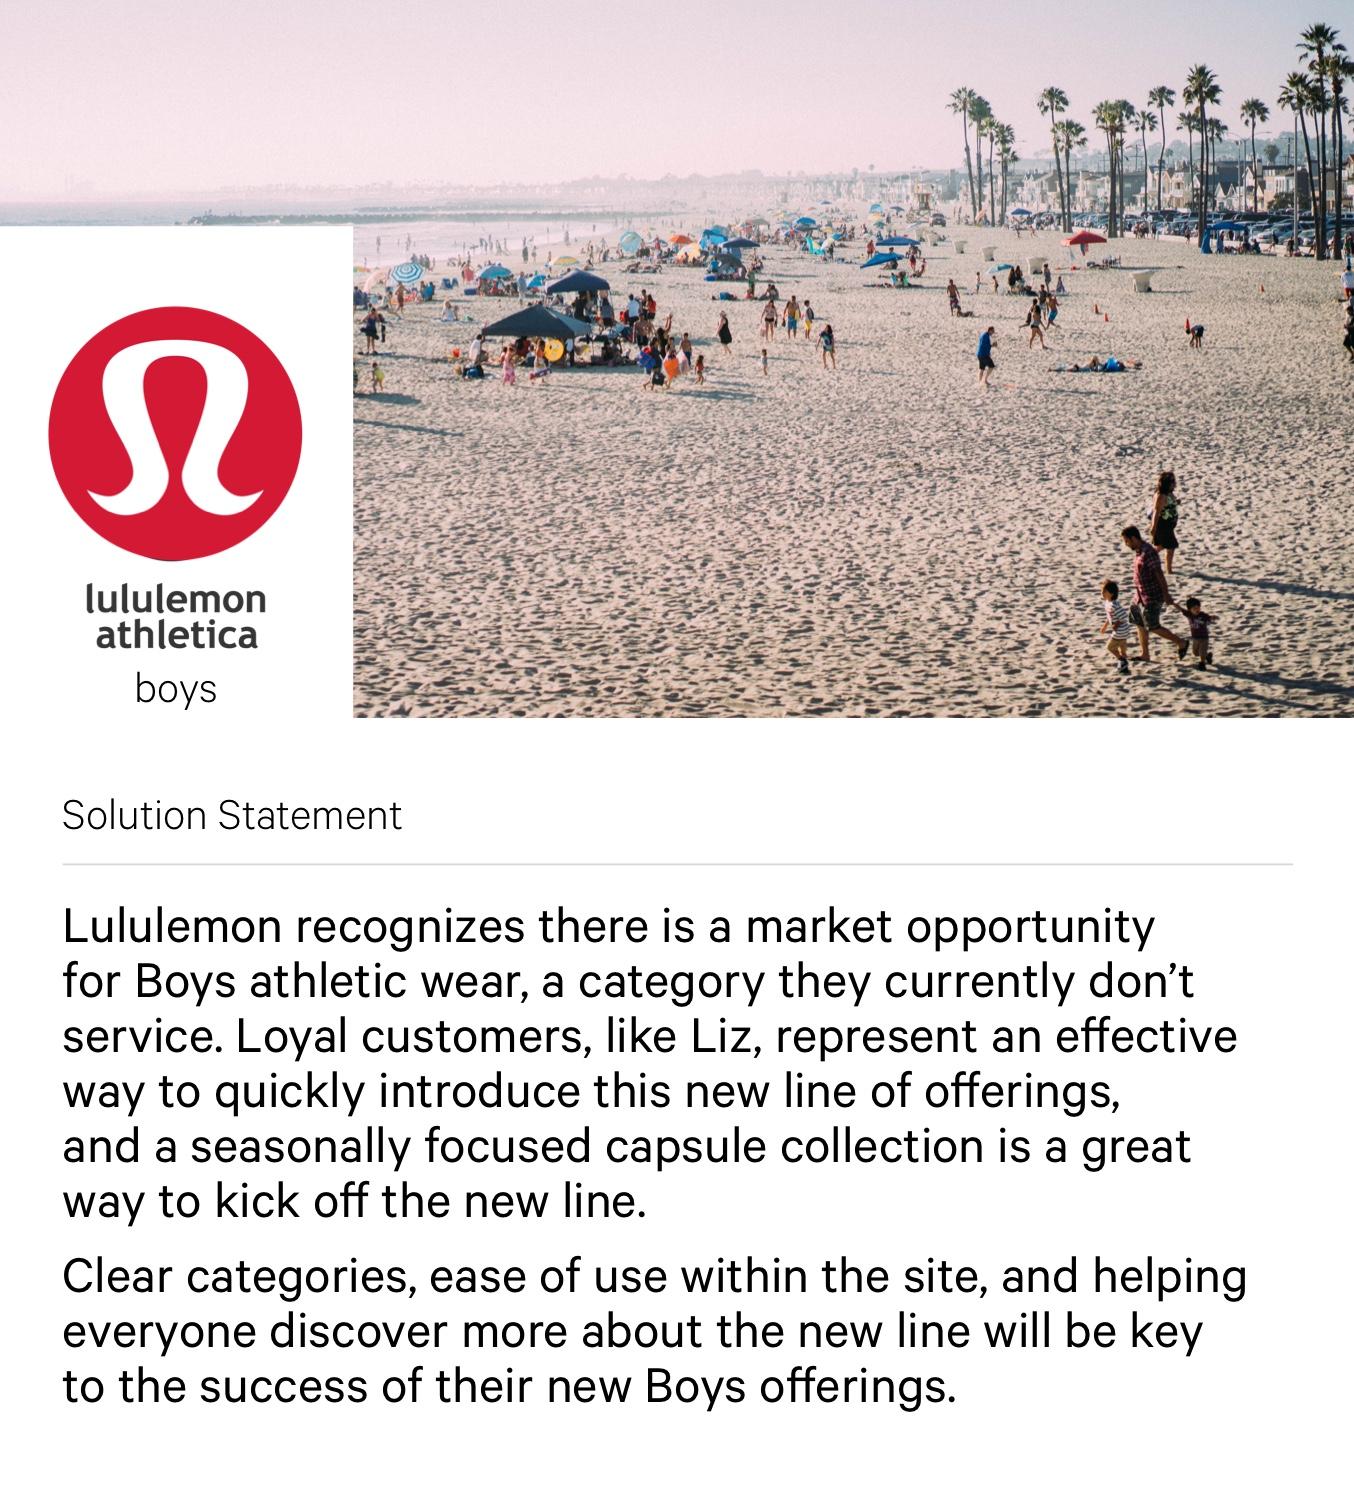 lulu_solution statement.jpg